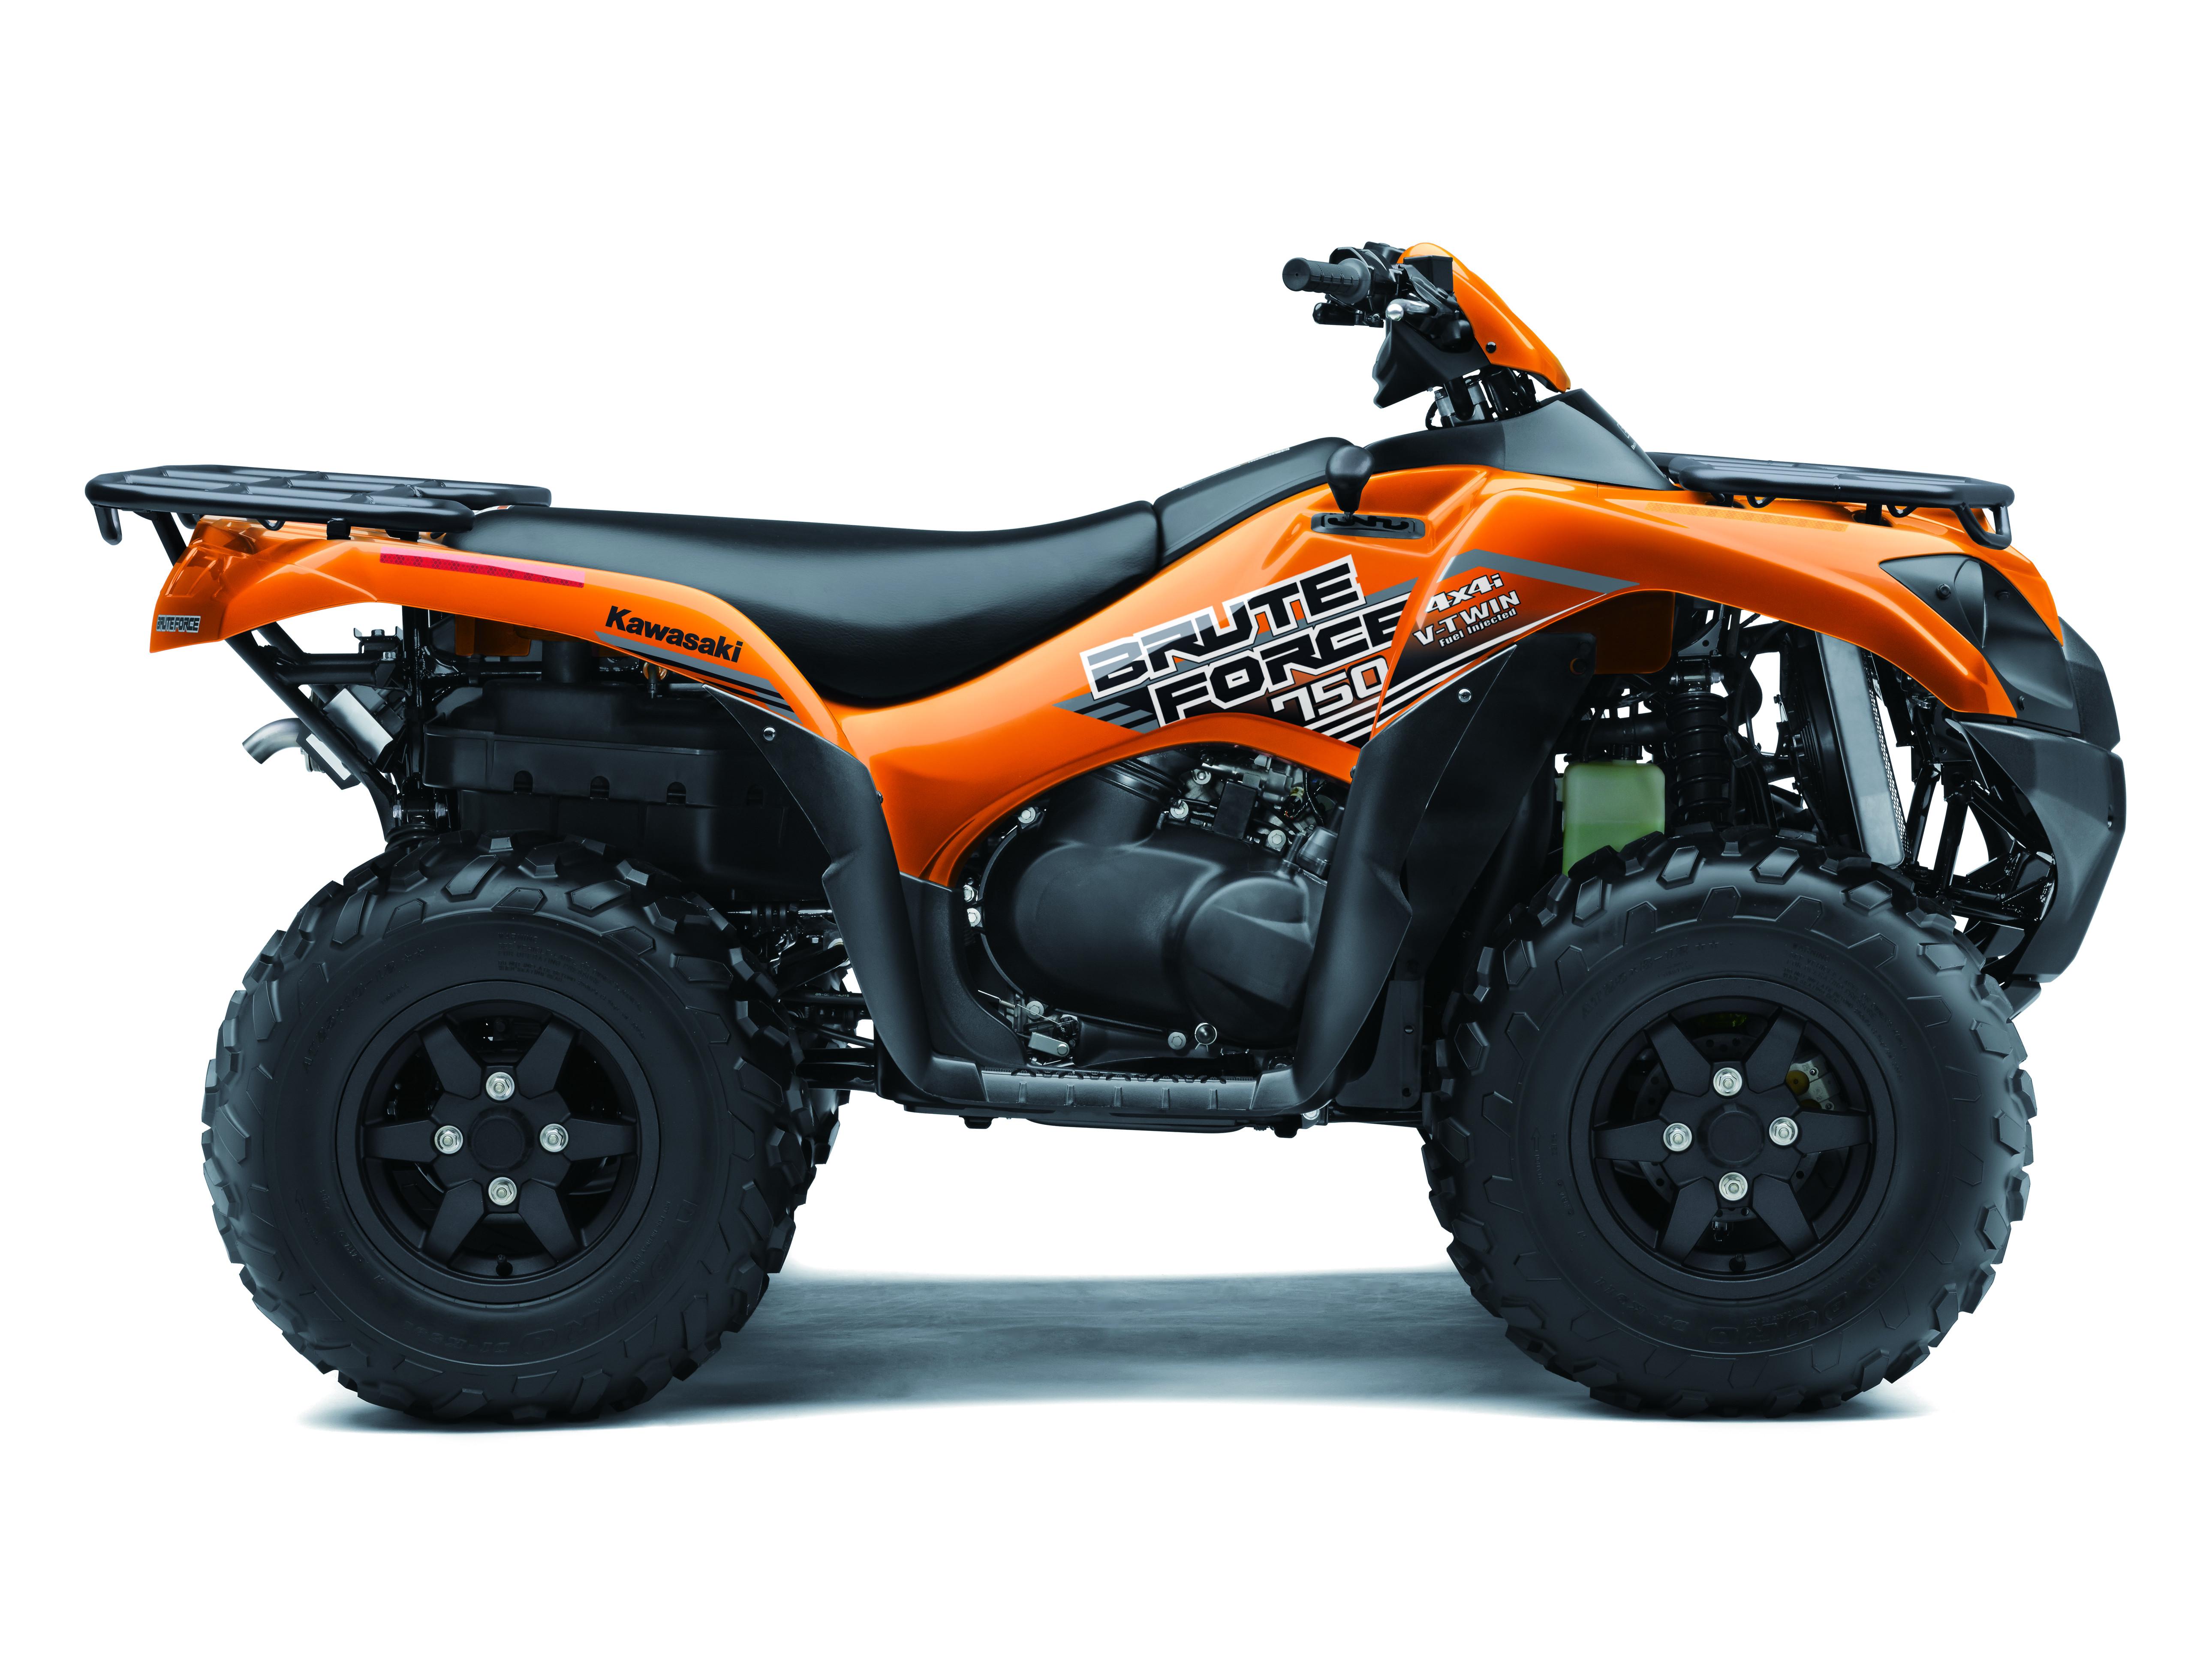 2020 Kawasaki Brute Force 750